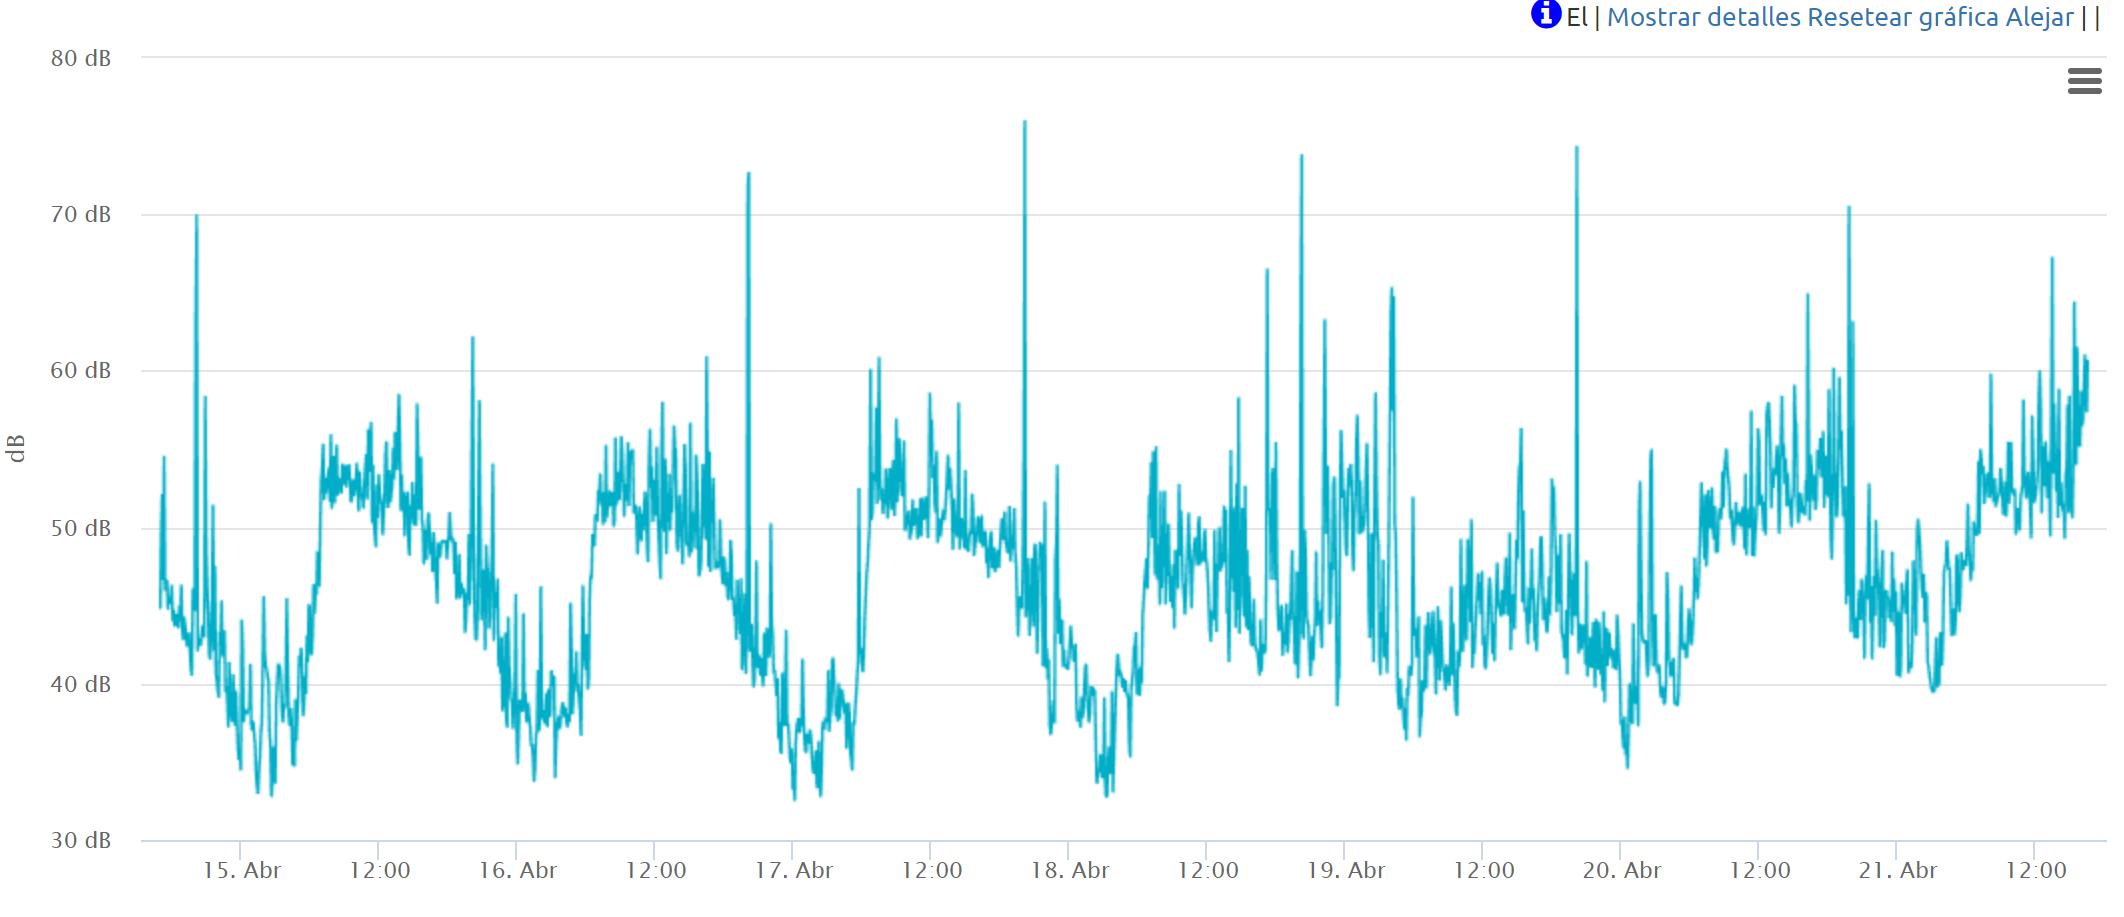 Gráfico 2. Sonido-hora Palma